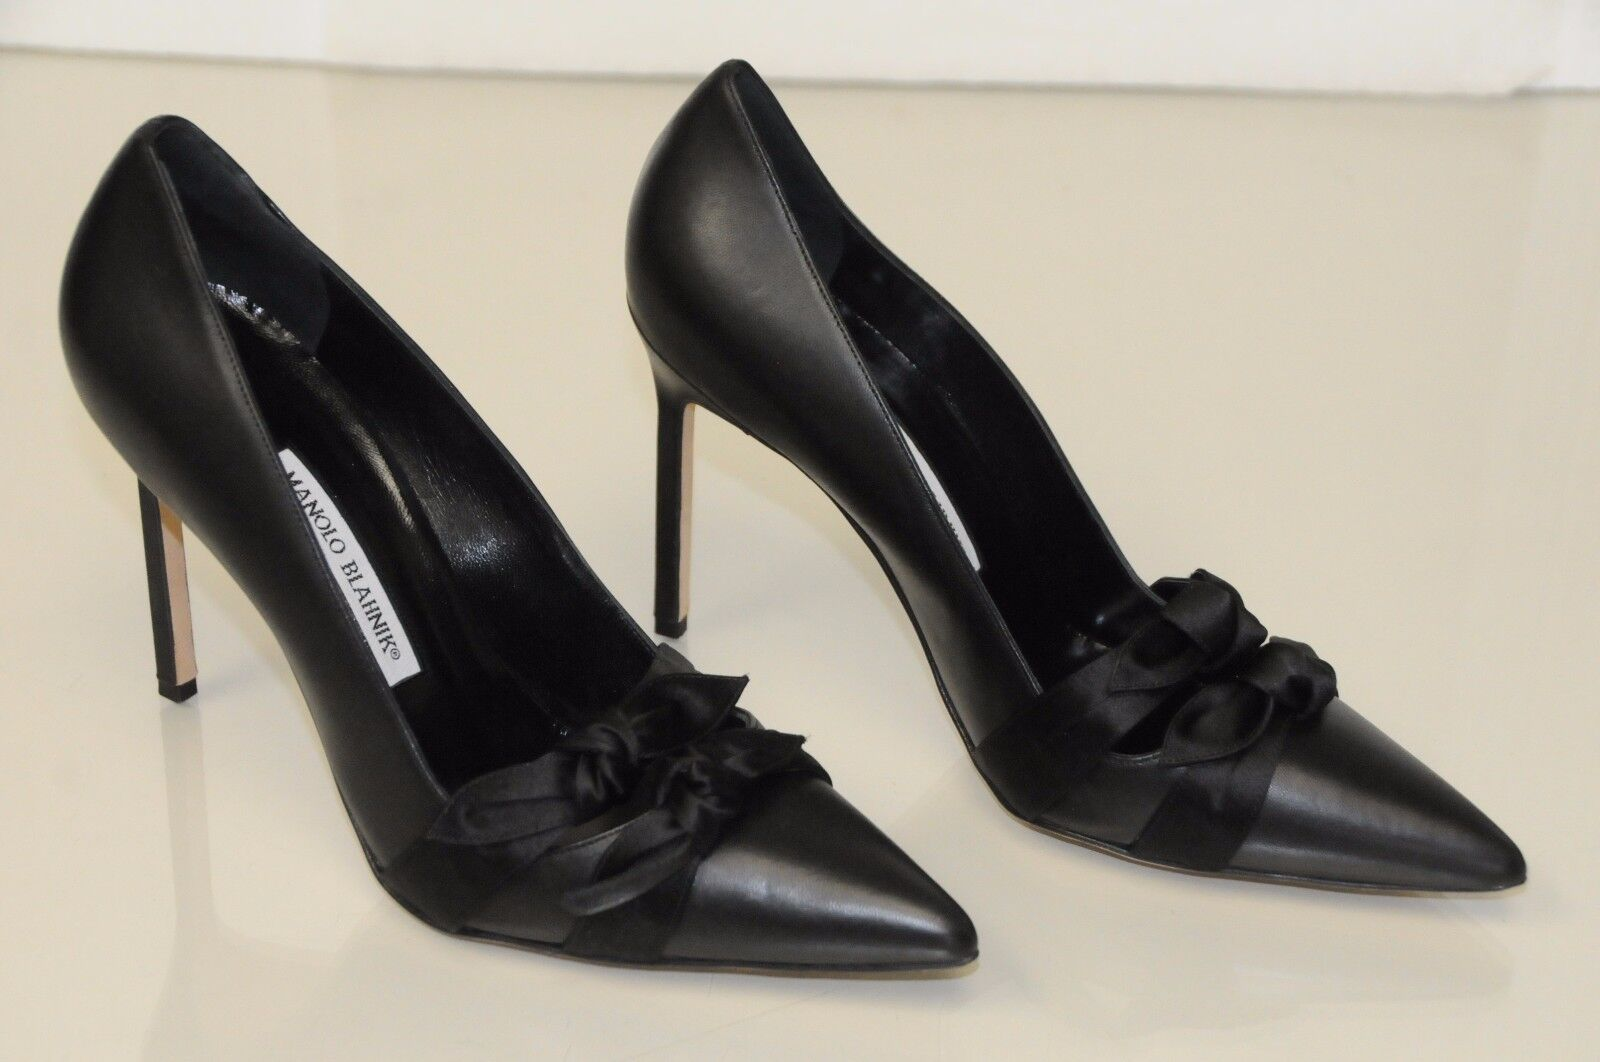 825 New Manolo Blahnik  BB Heel Black Leather Satin 105  Pumps shoes 40.5 41.5